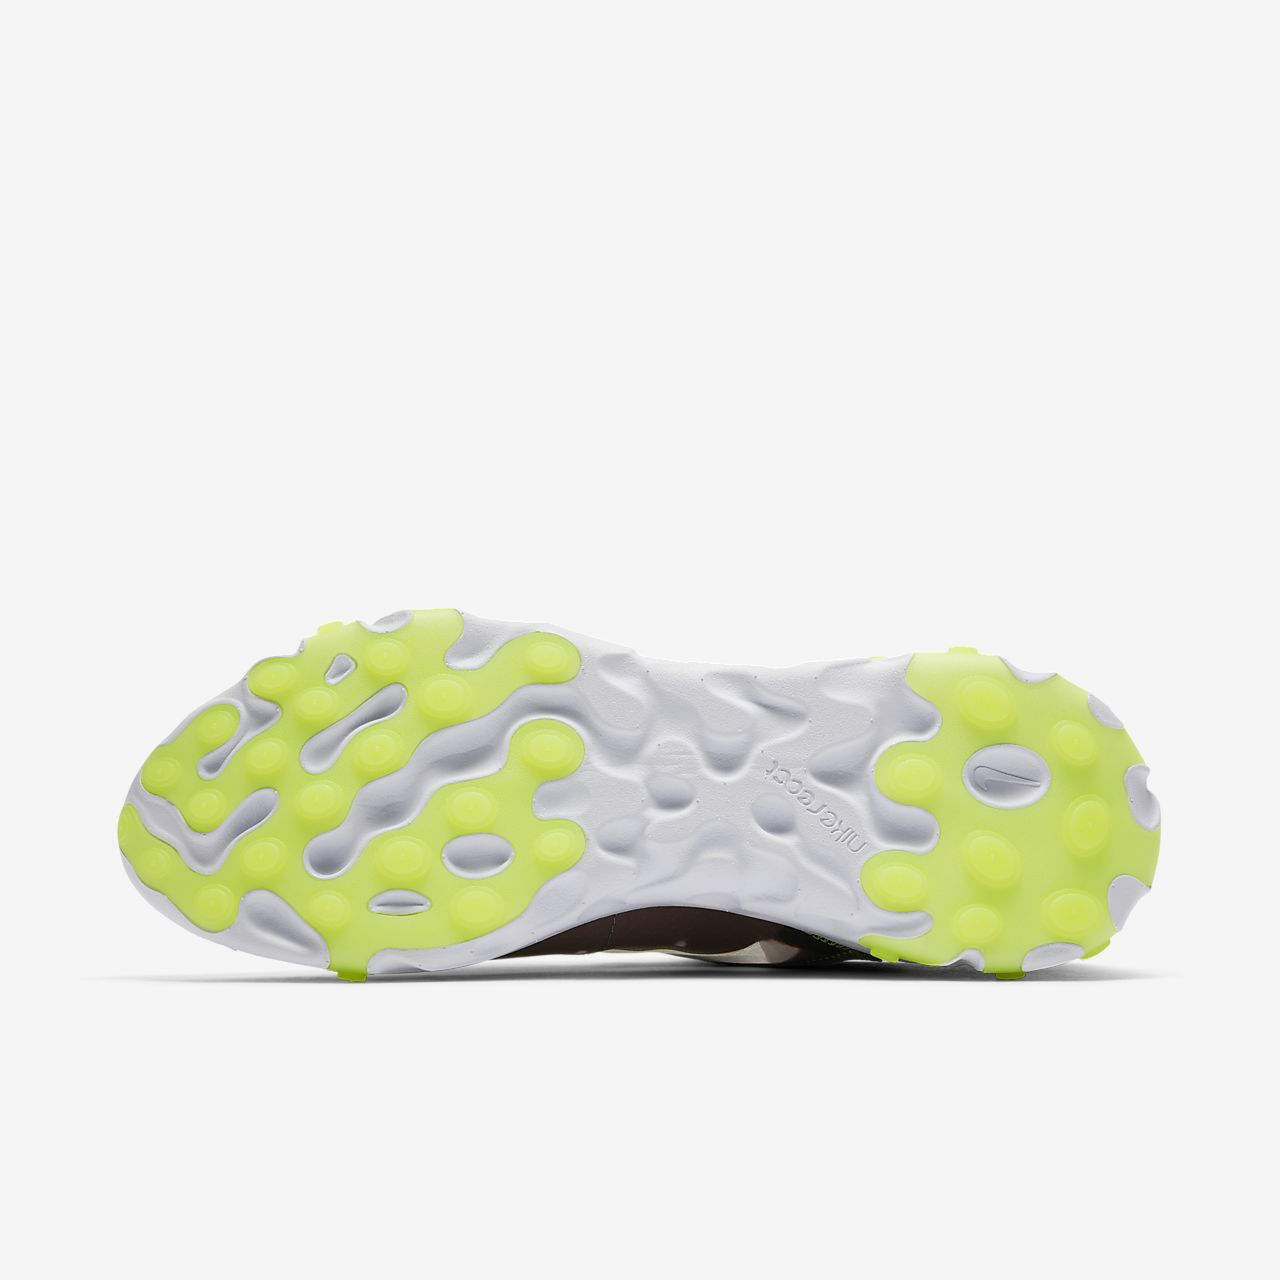 58f9f4c0ca61 Nike React Element 87 Men s Shoe. Nike.com ZA